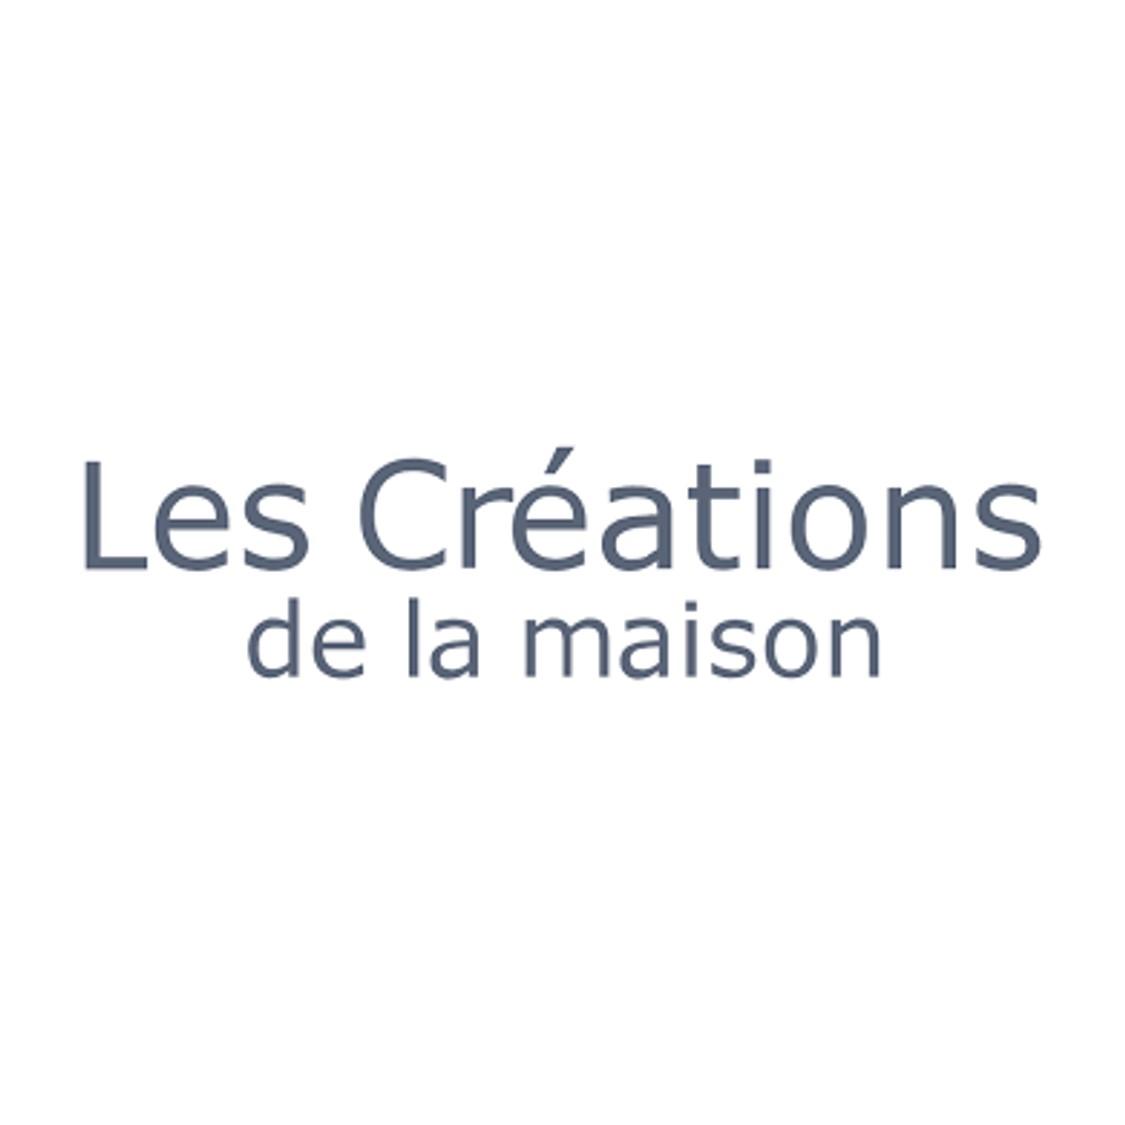 https://anafexmainteriorismo.com/wp-content/uploads/2018/06/Logo-Les-Creations-de-la-Maison.png.jpg